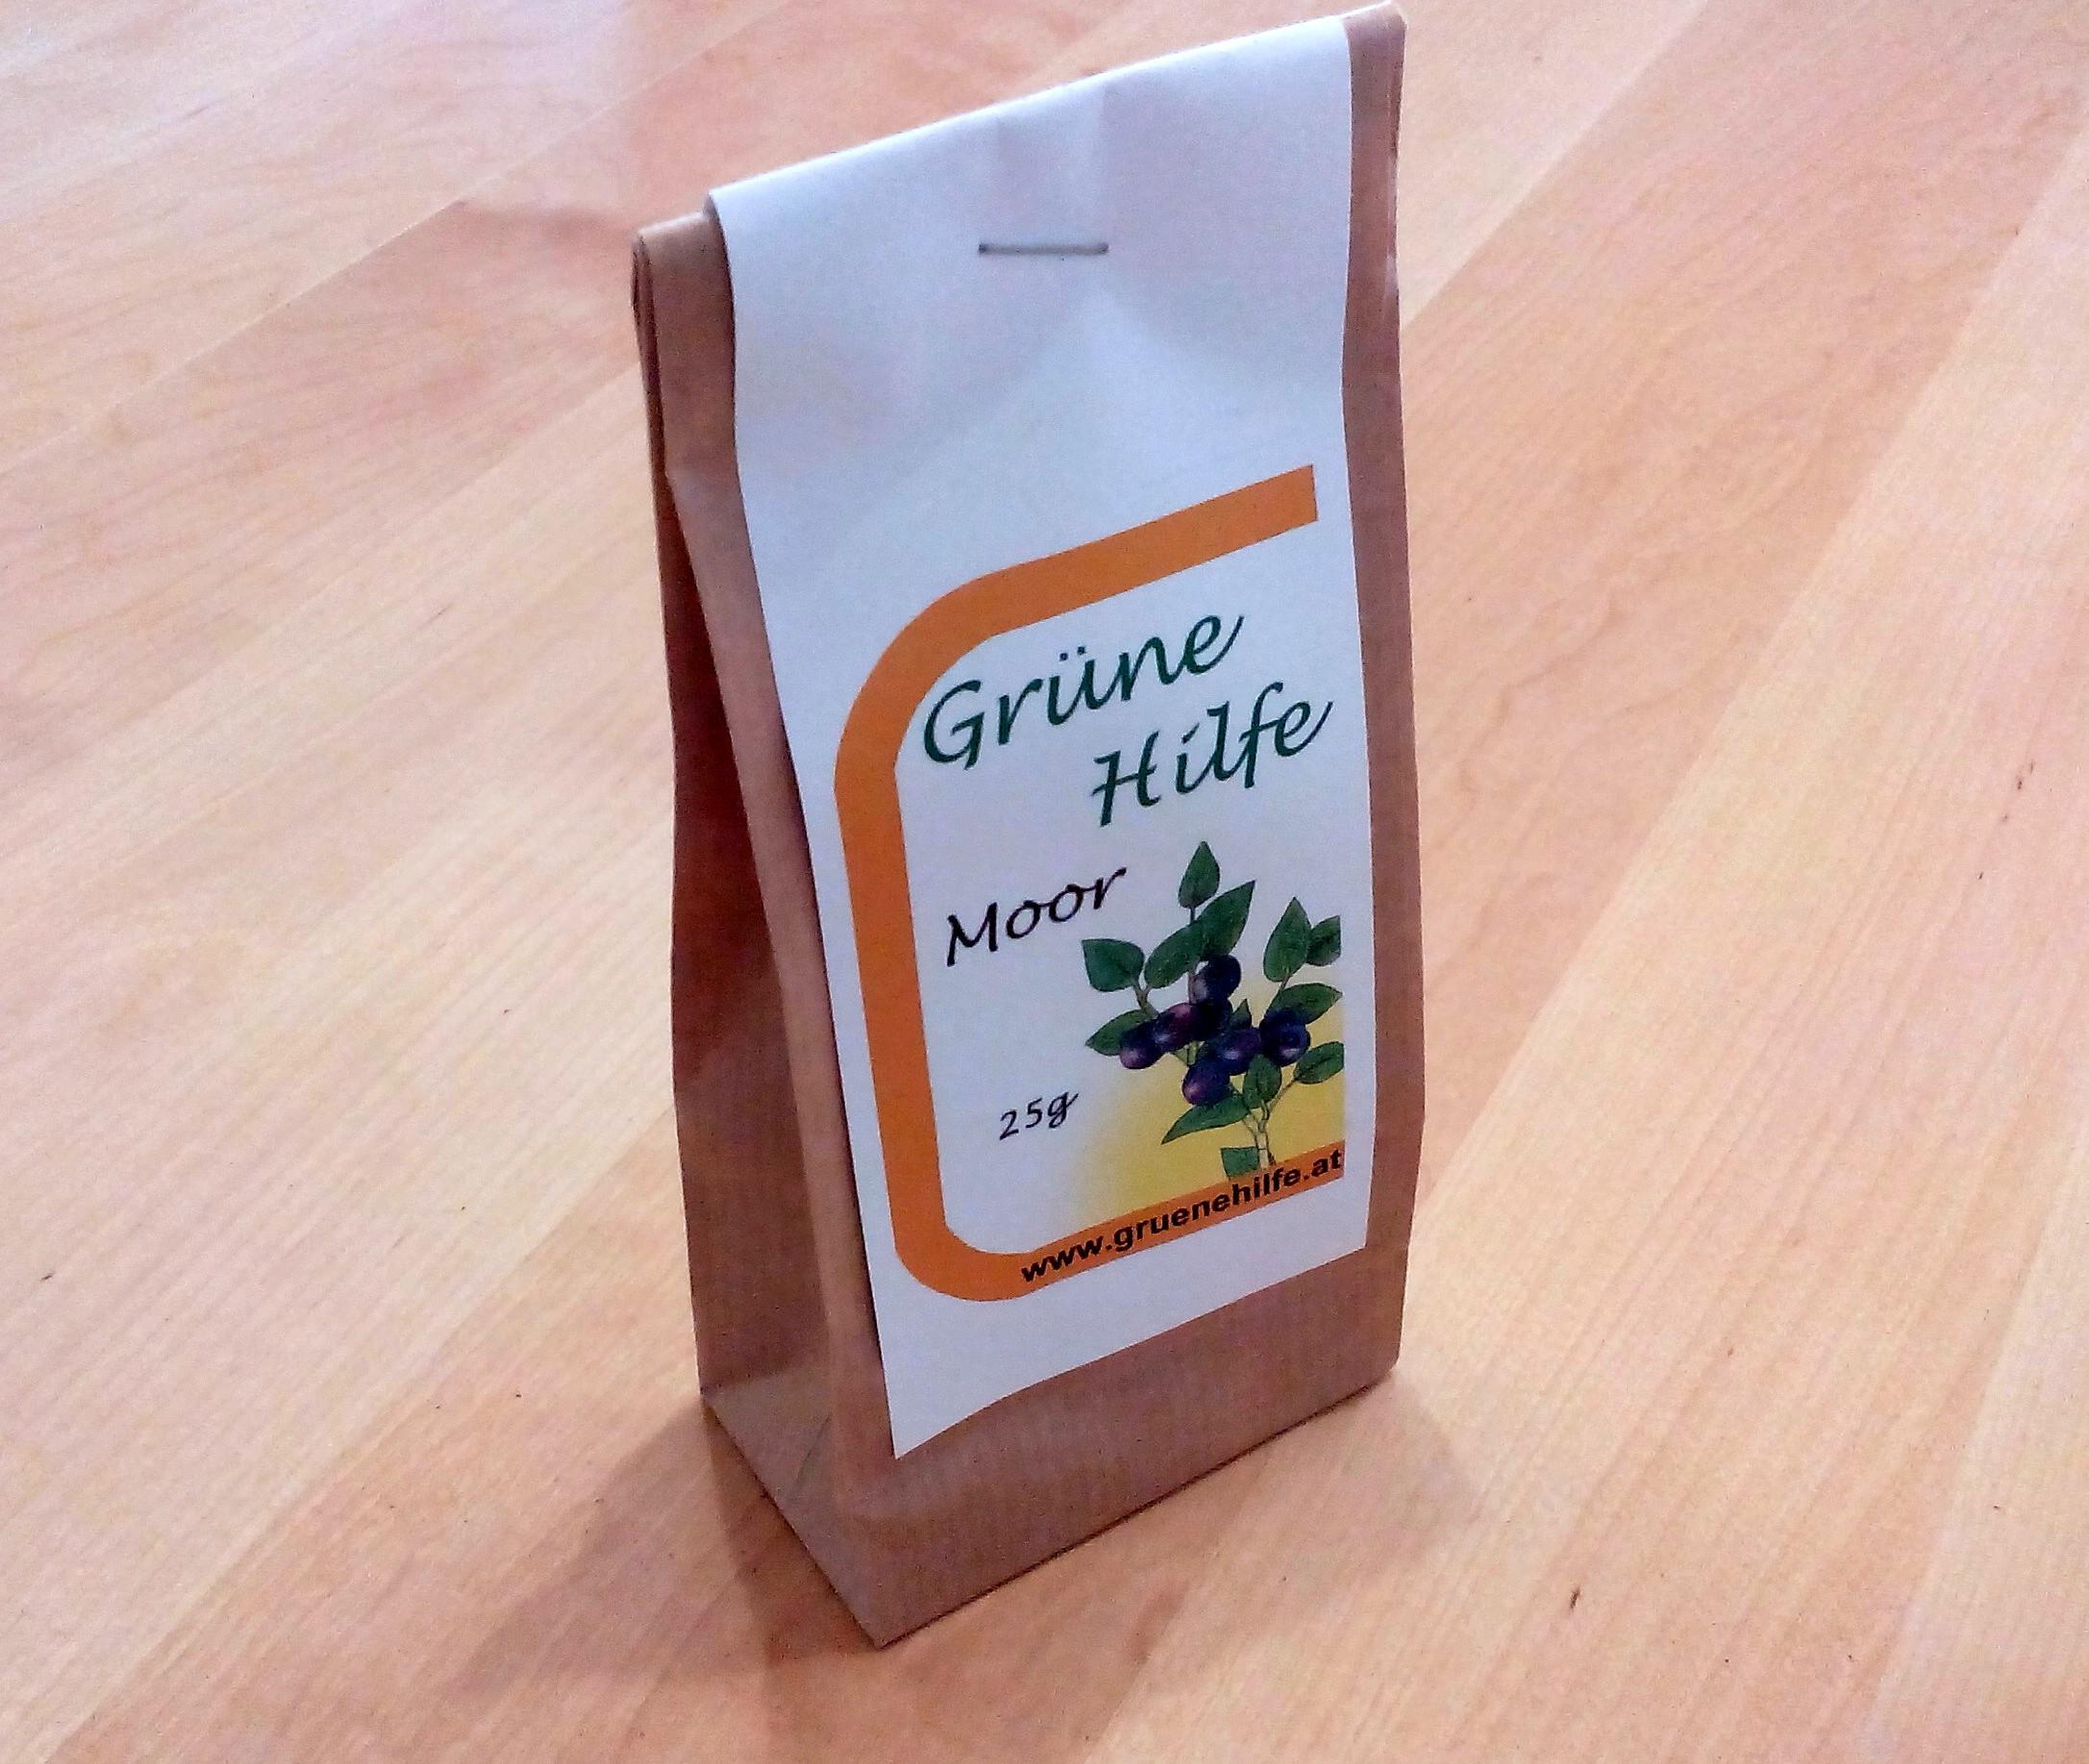 GrüneHilfe Moor Single